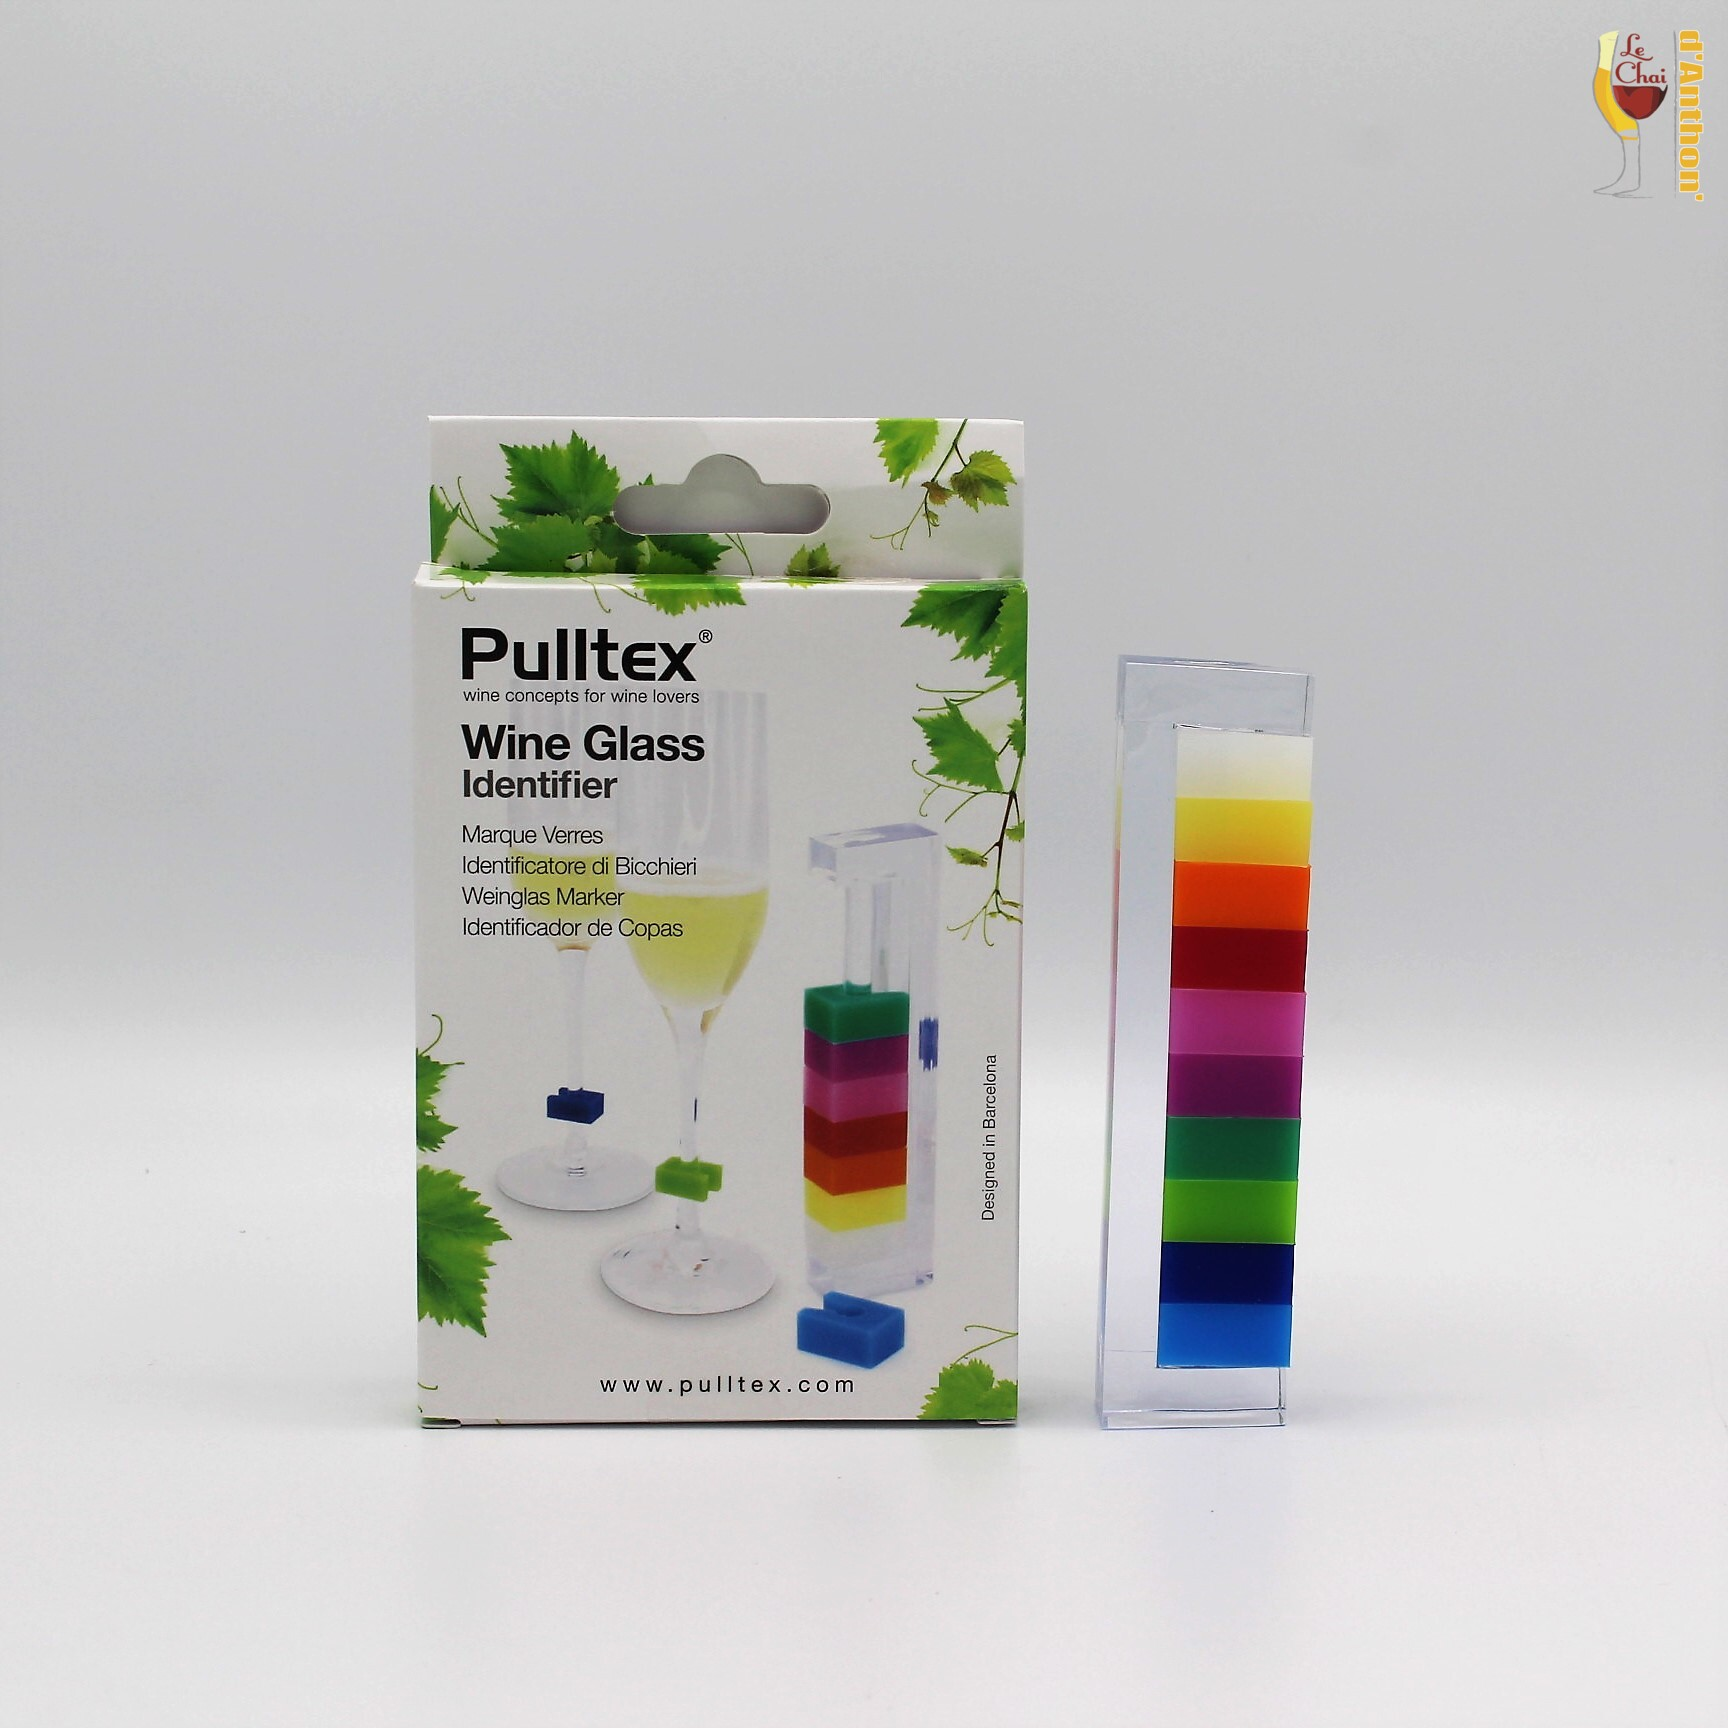 Accessoires Marque Verre Wine Glasse Pulltex (2)